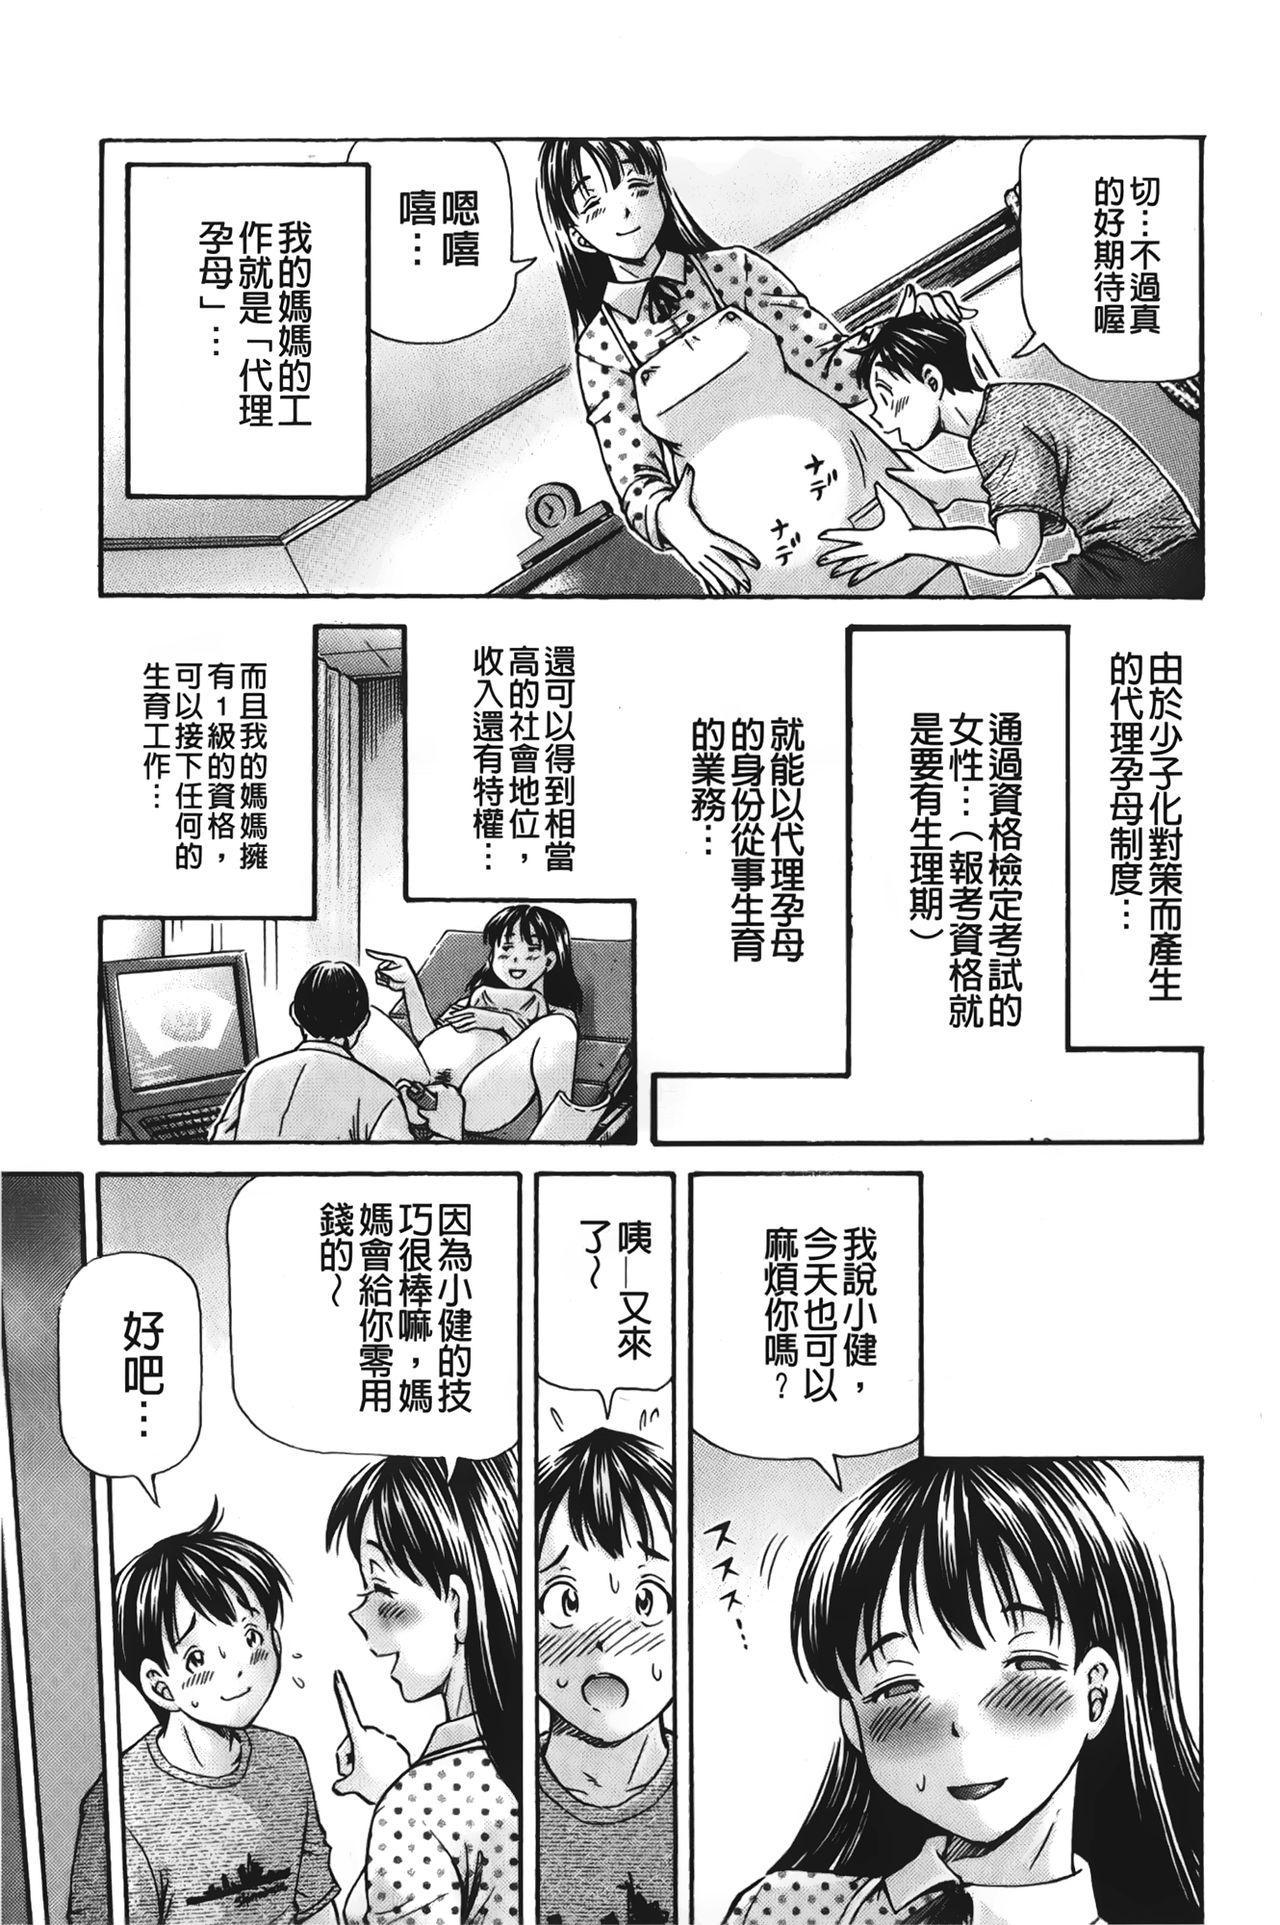 pookori meikingu | 懷孕少女的製造者 173